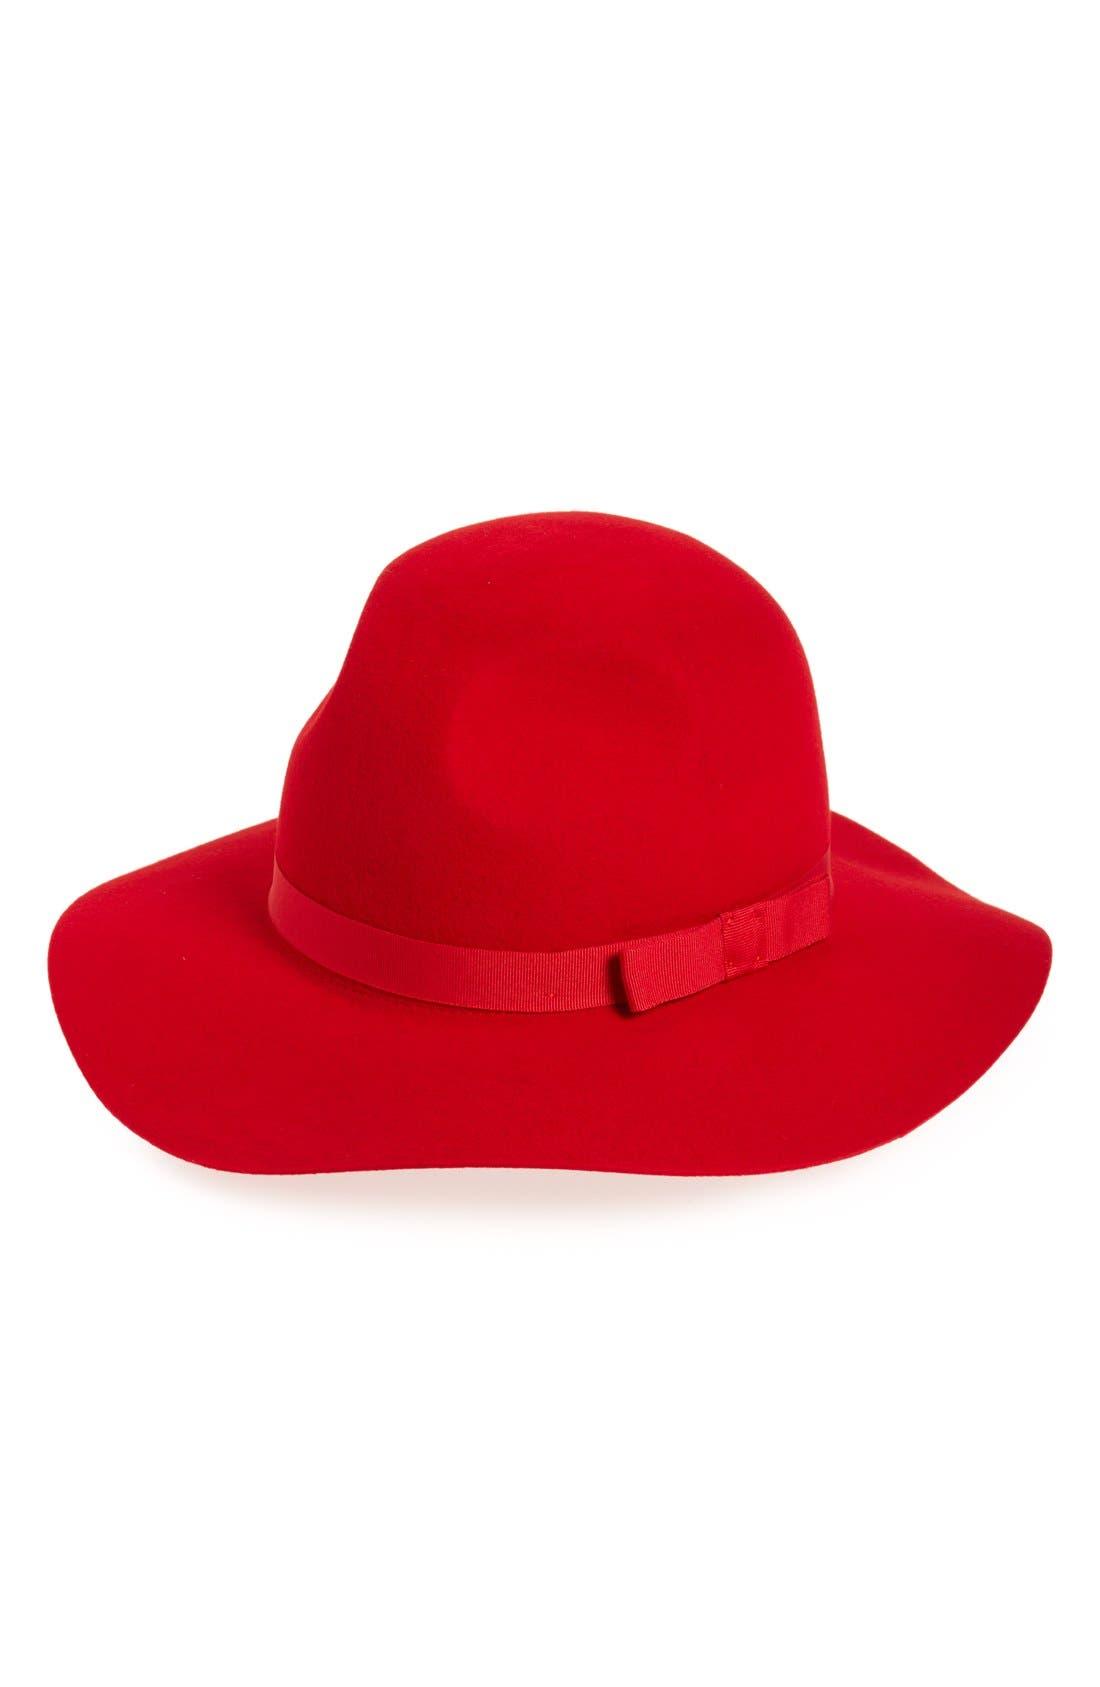 Main Image - Brixton 'Dahlia' Floppy Brim Wool Hat